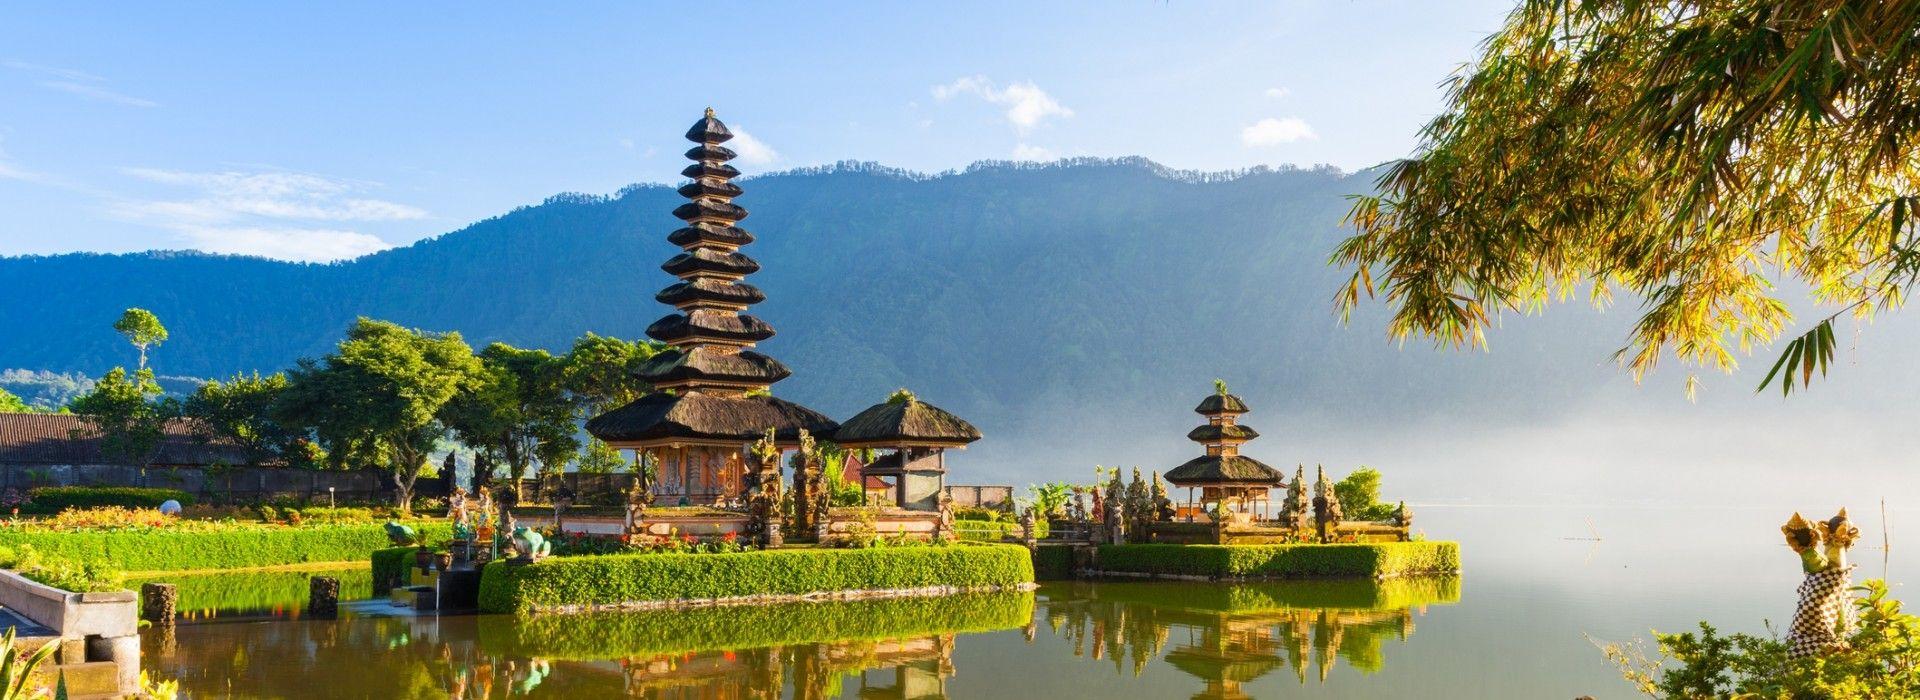 Marine wildlife Tours in Indonesia